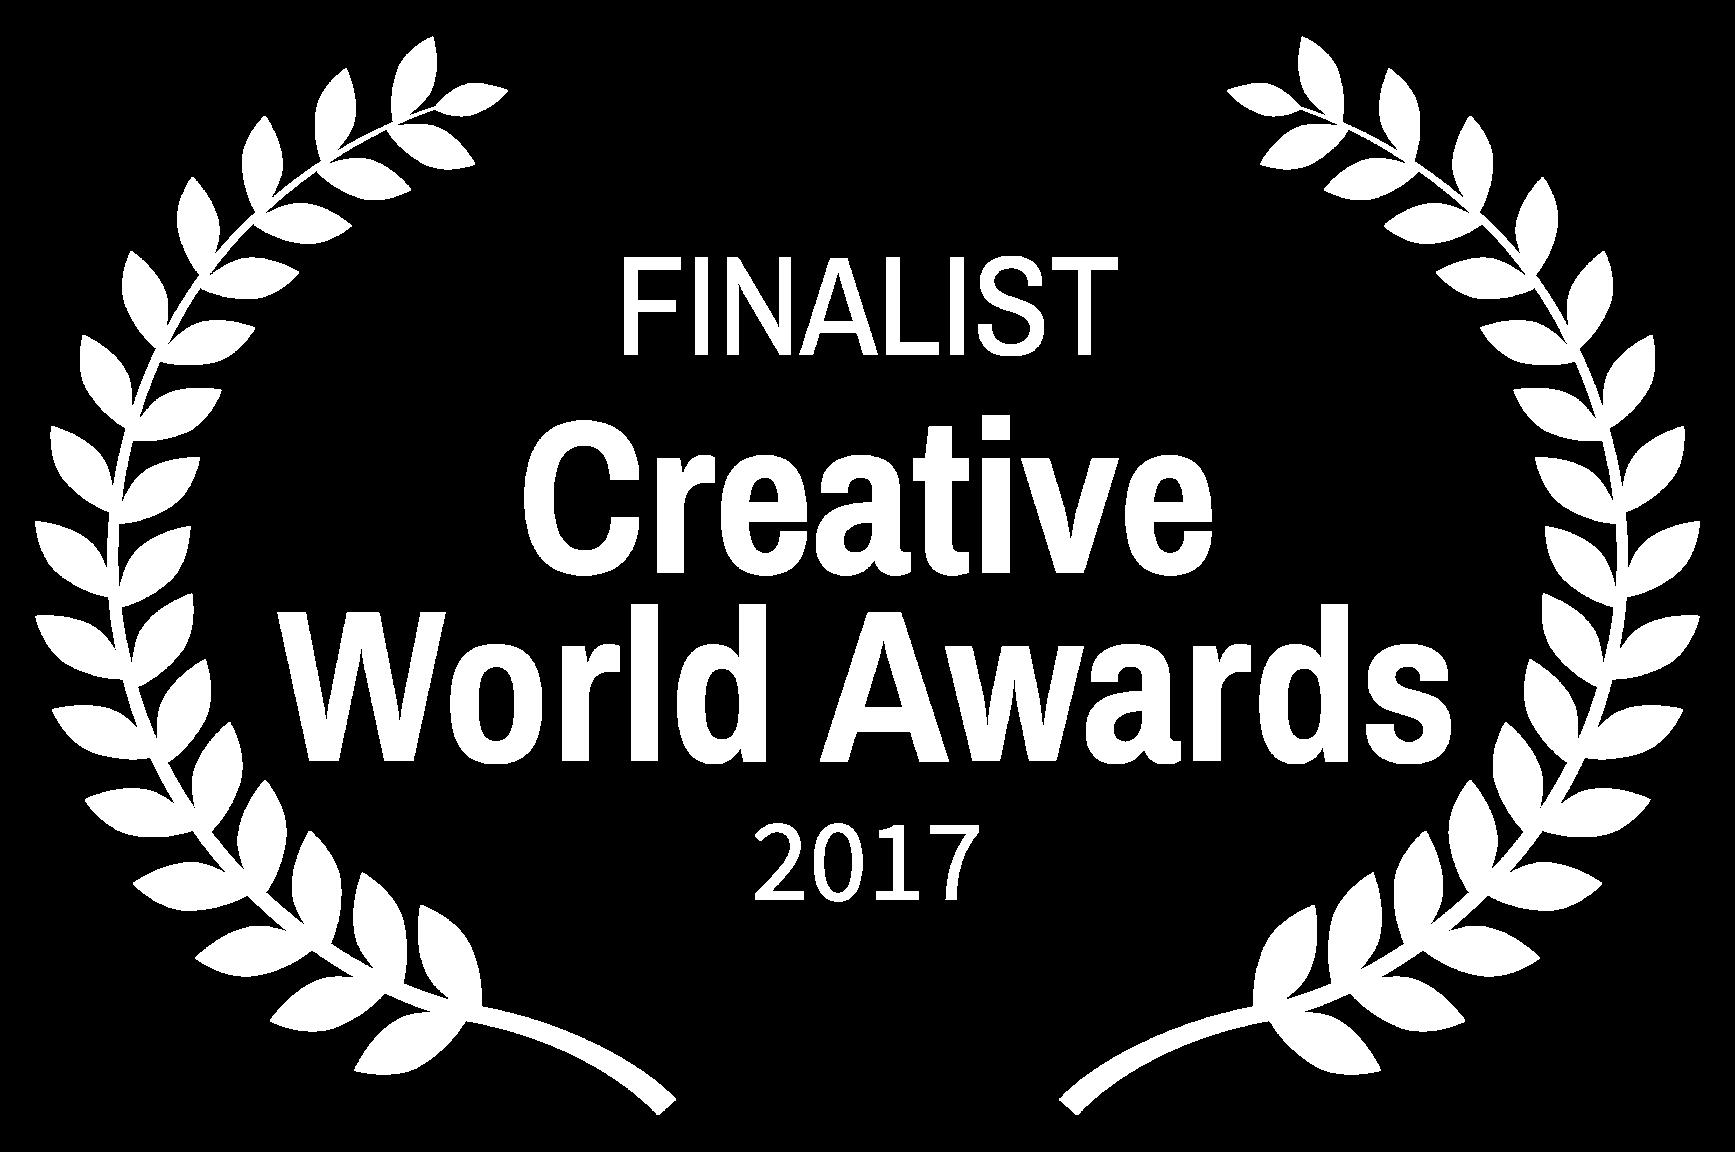 FINALIST - Creative World Awards - 2017.png